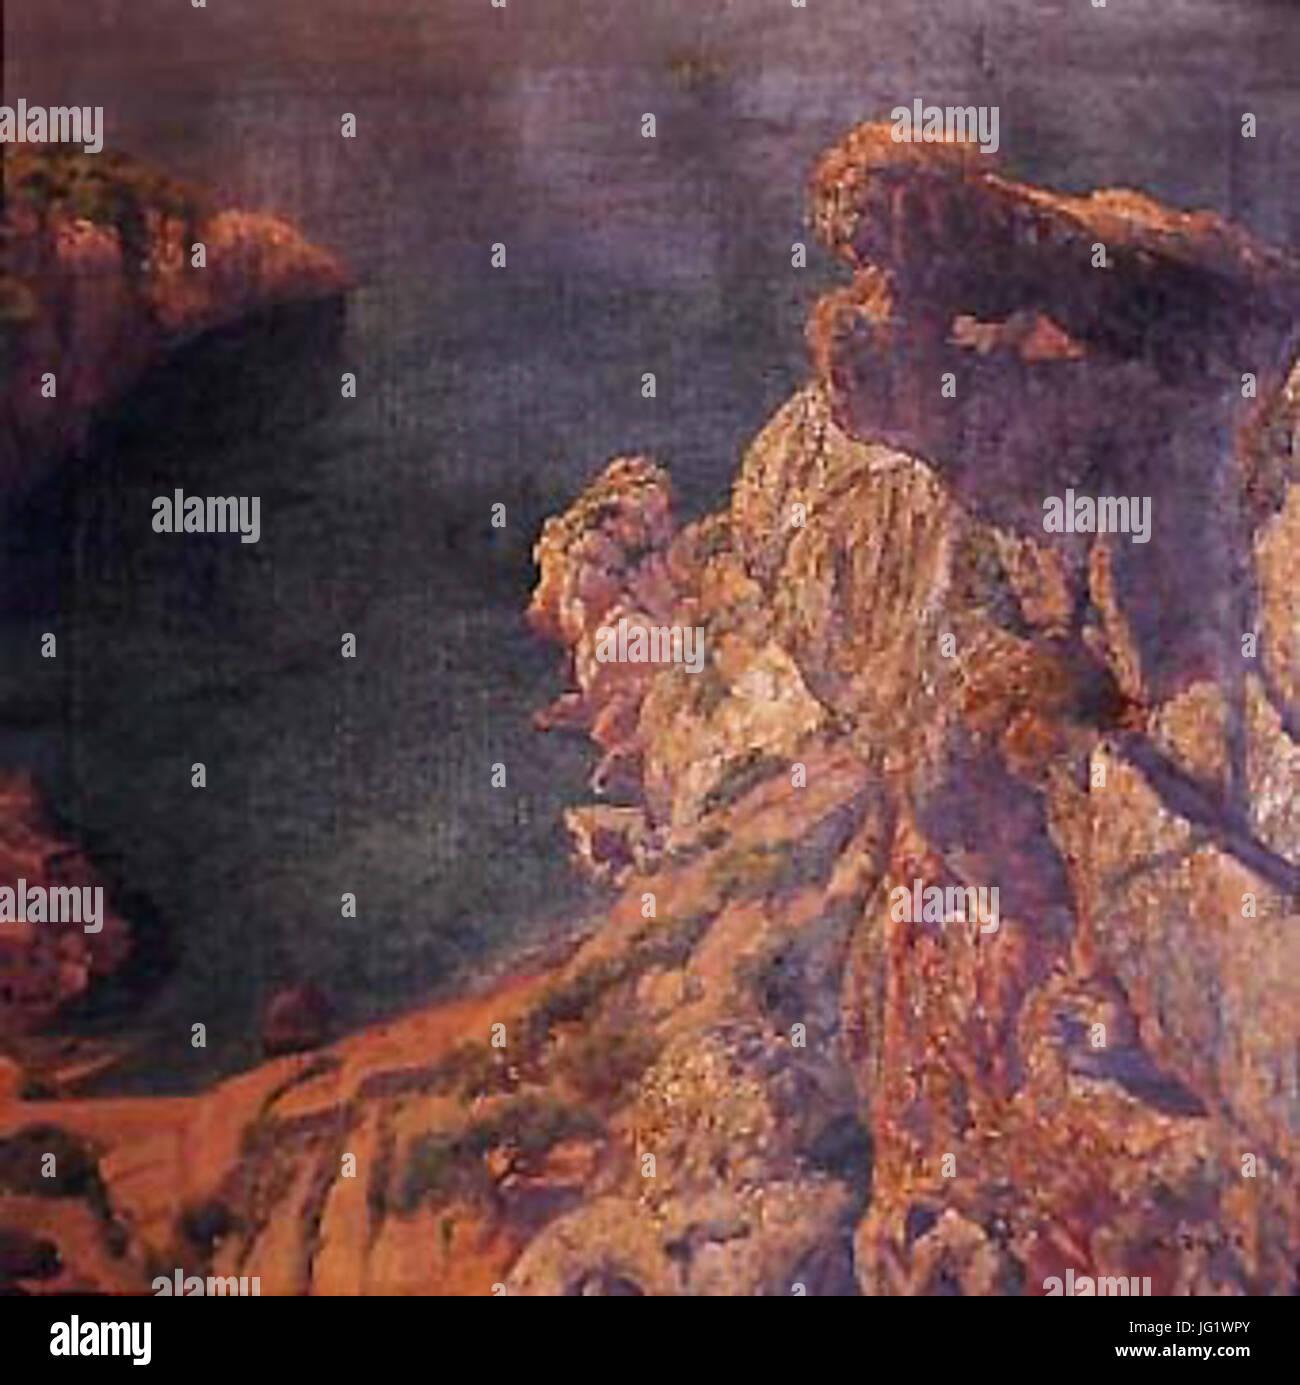 DEIơ380 - ALEXANDRE DE RIQUER I YNGLADA - Stock Image